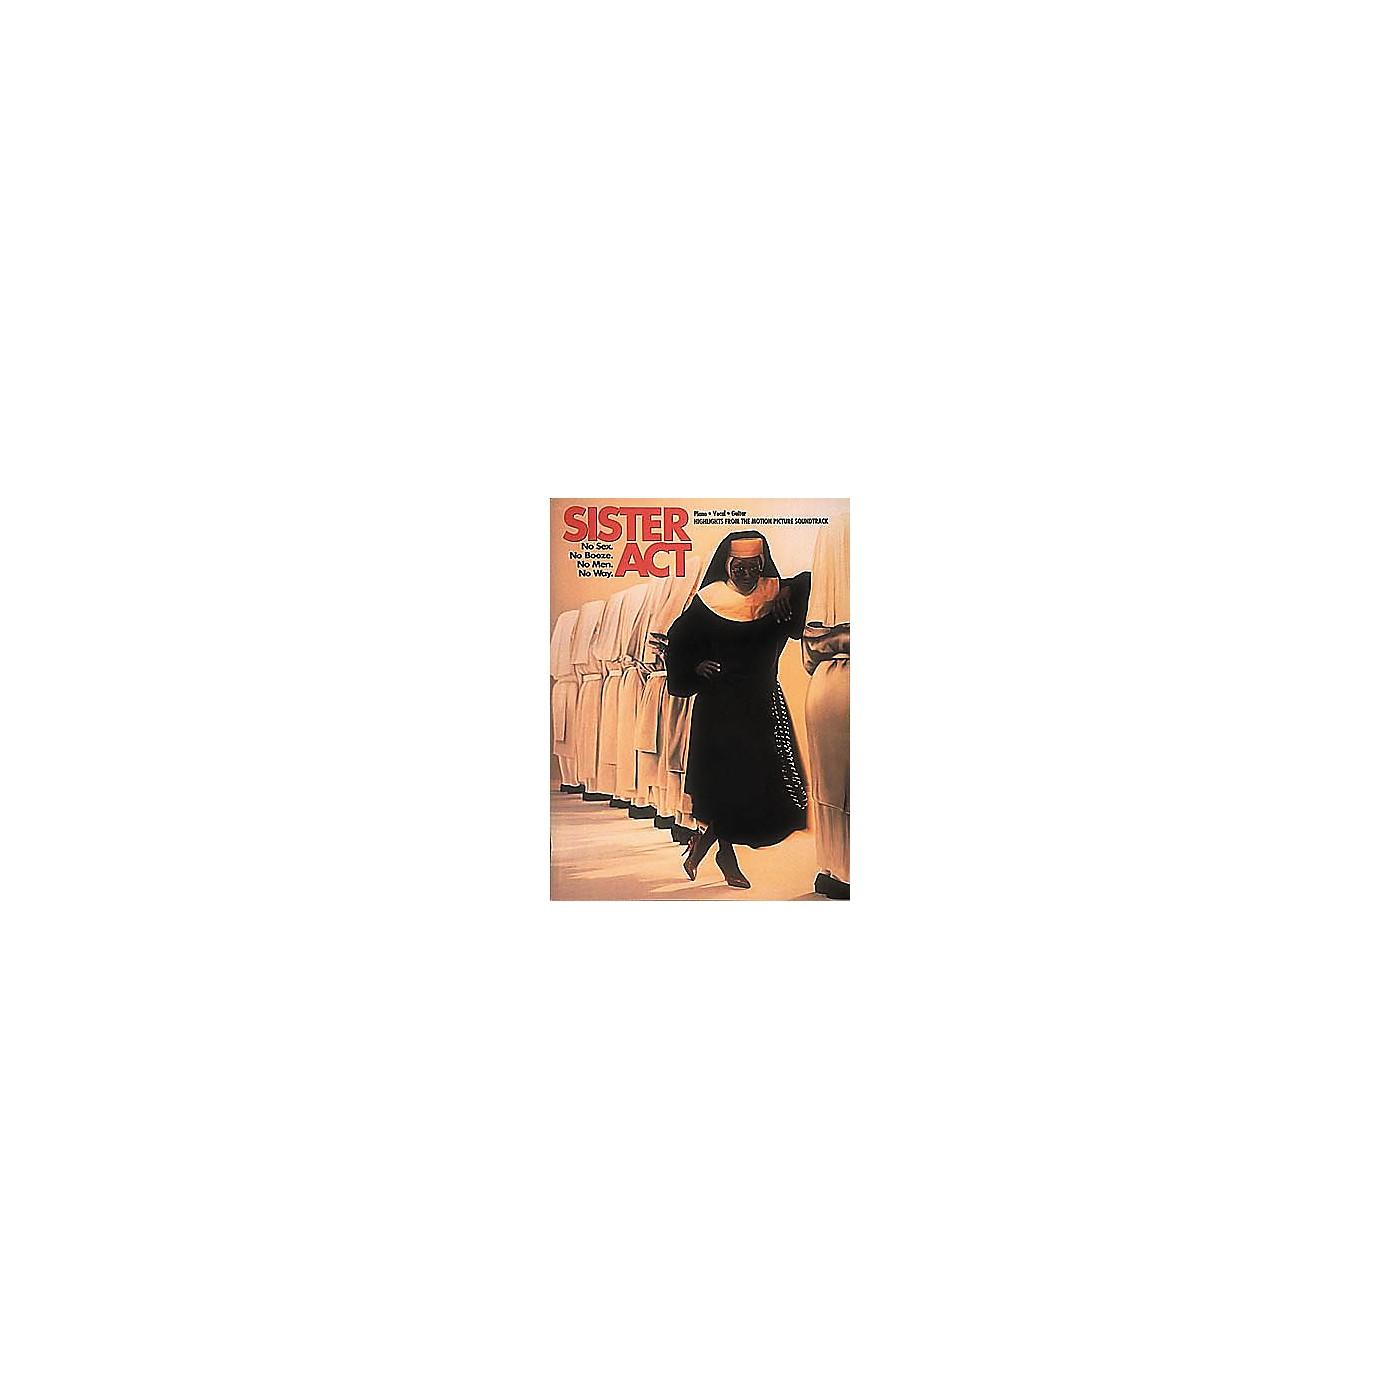 Hal Leonard Sister Act Piano, Vocal, Guitar Songbook thumbnail